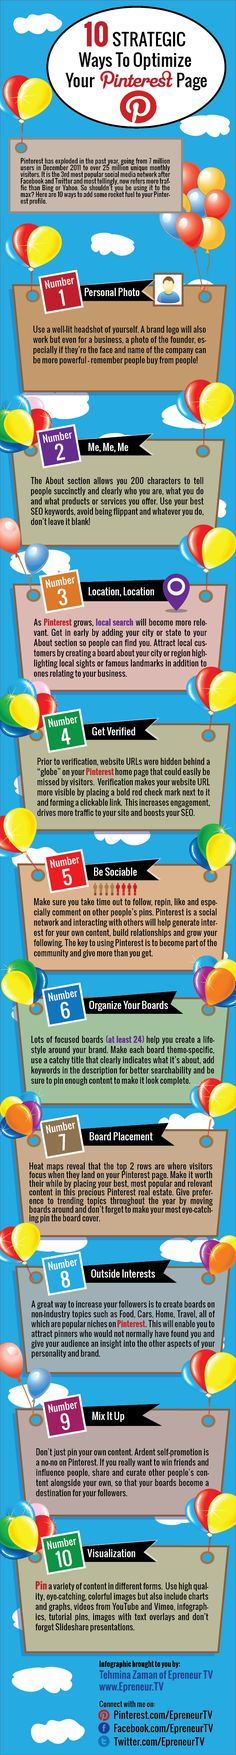 10 Strategic Ways to Optimize Your Pinterest Page for business at internetmarketingtrainingcenter.net